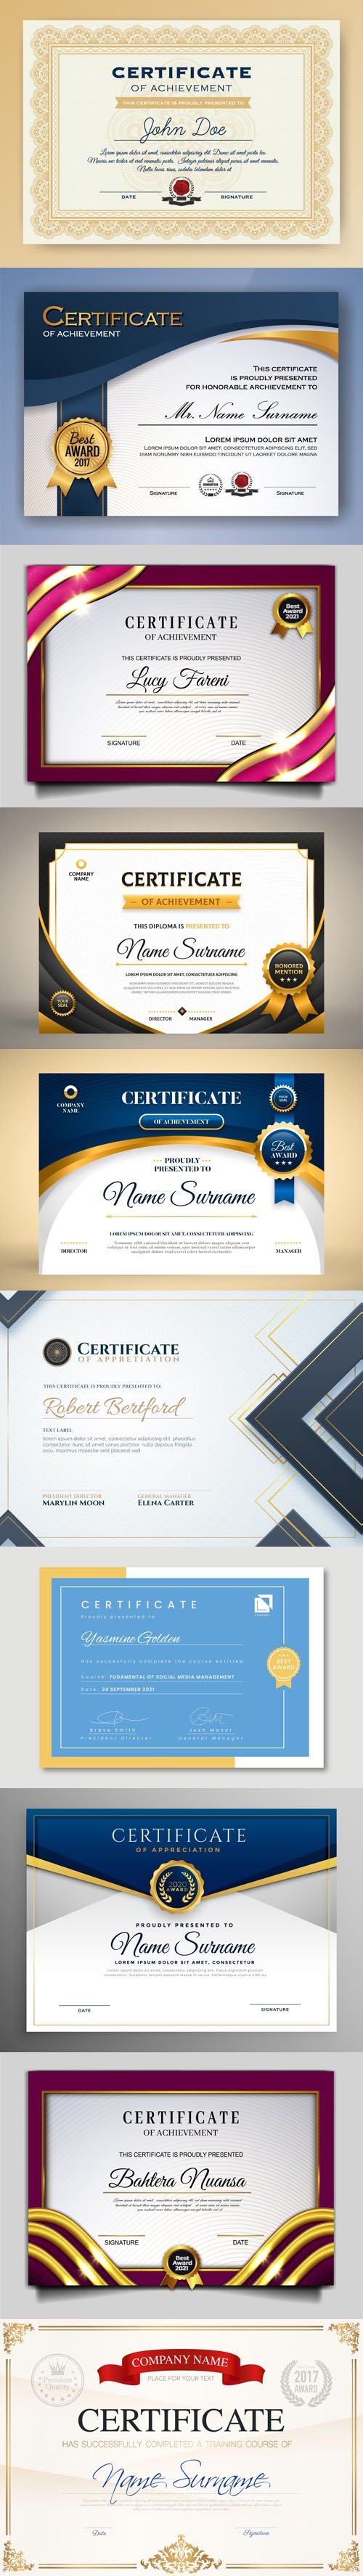 10 Professional Certificates Design Vector Templates